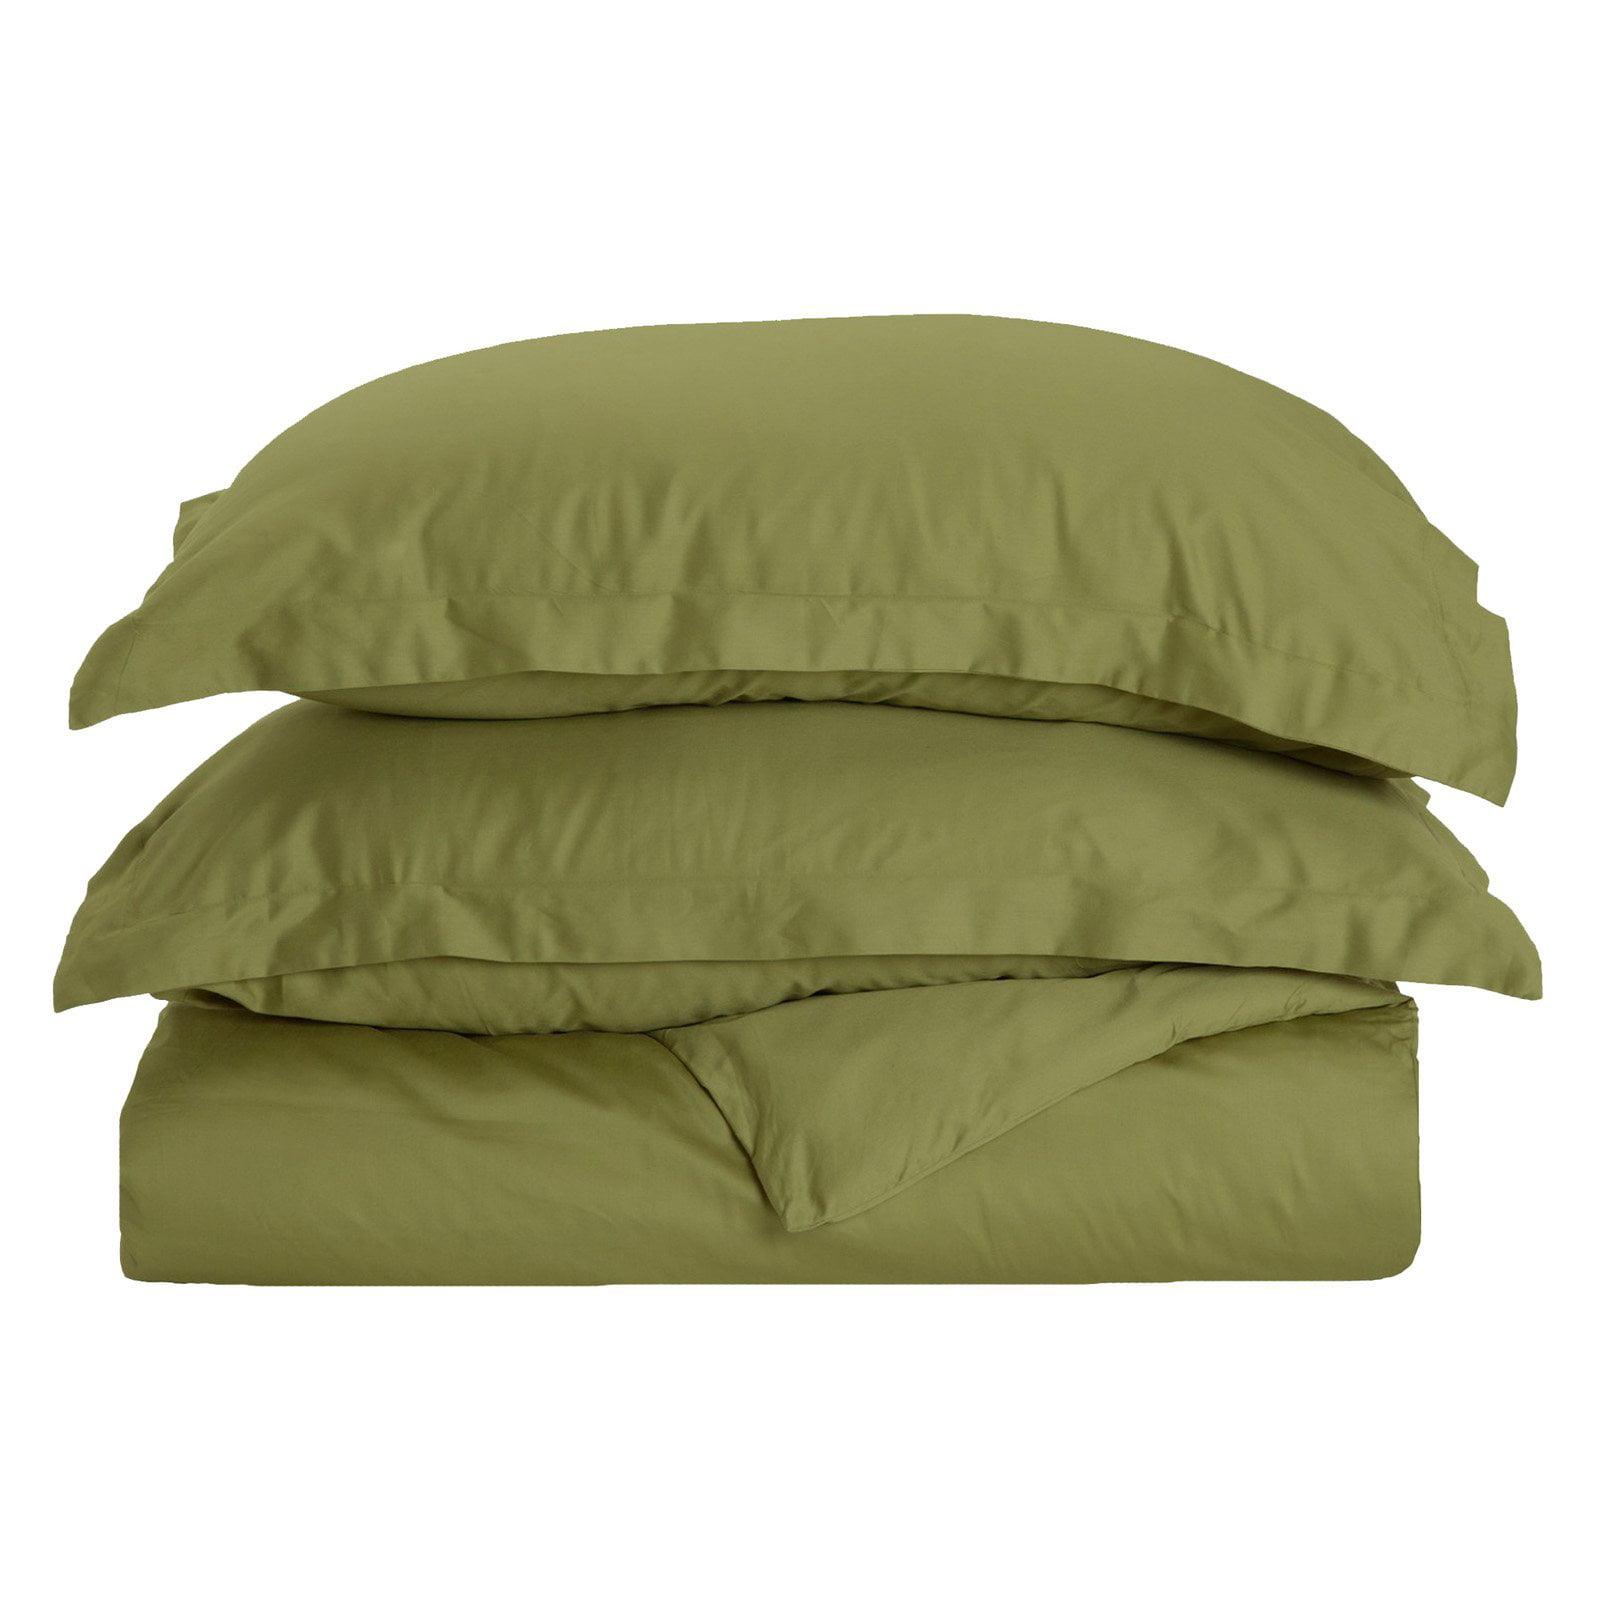 Superior 400 Thread Count Long-Staple Combed Cotton Duvet Cover Set